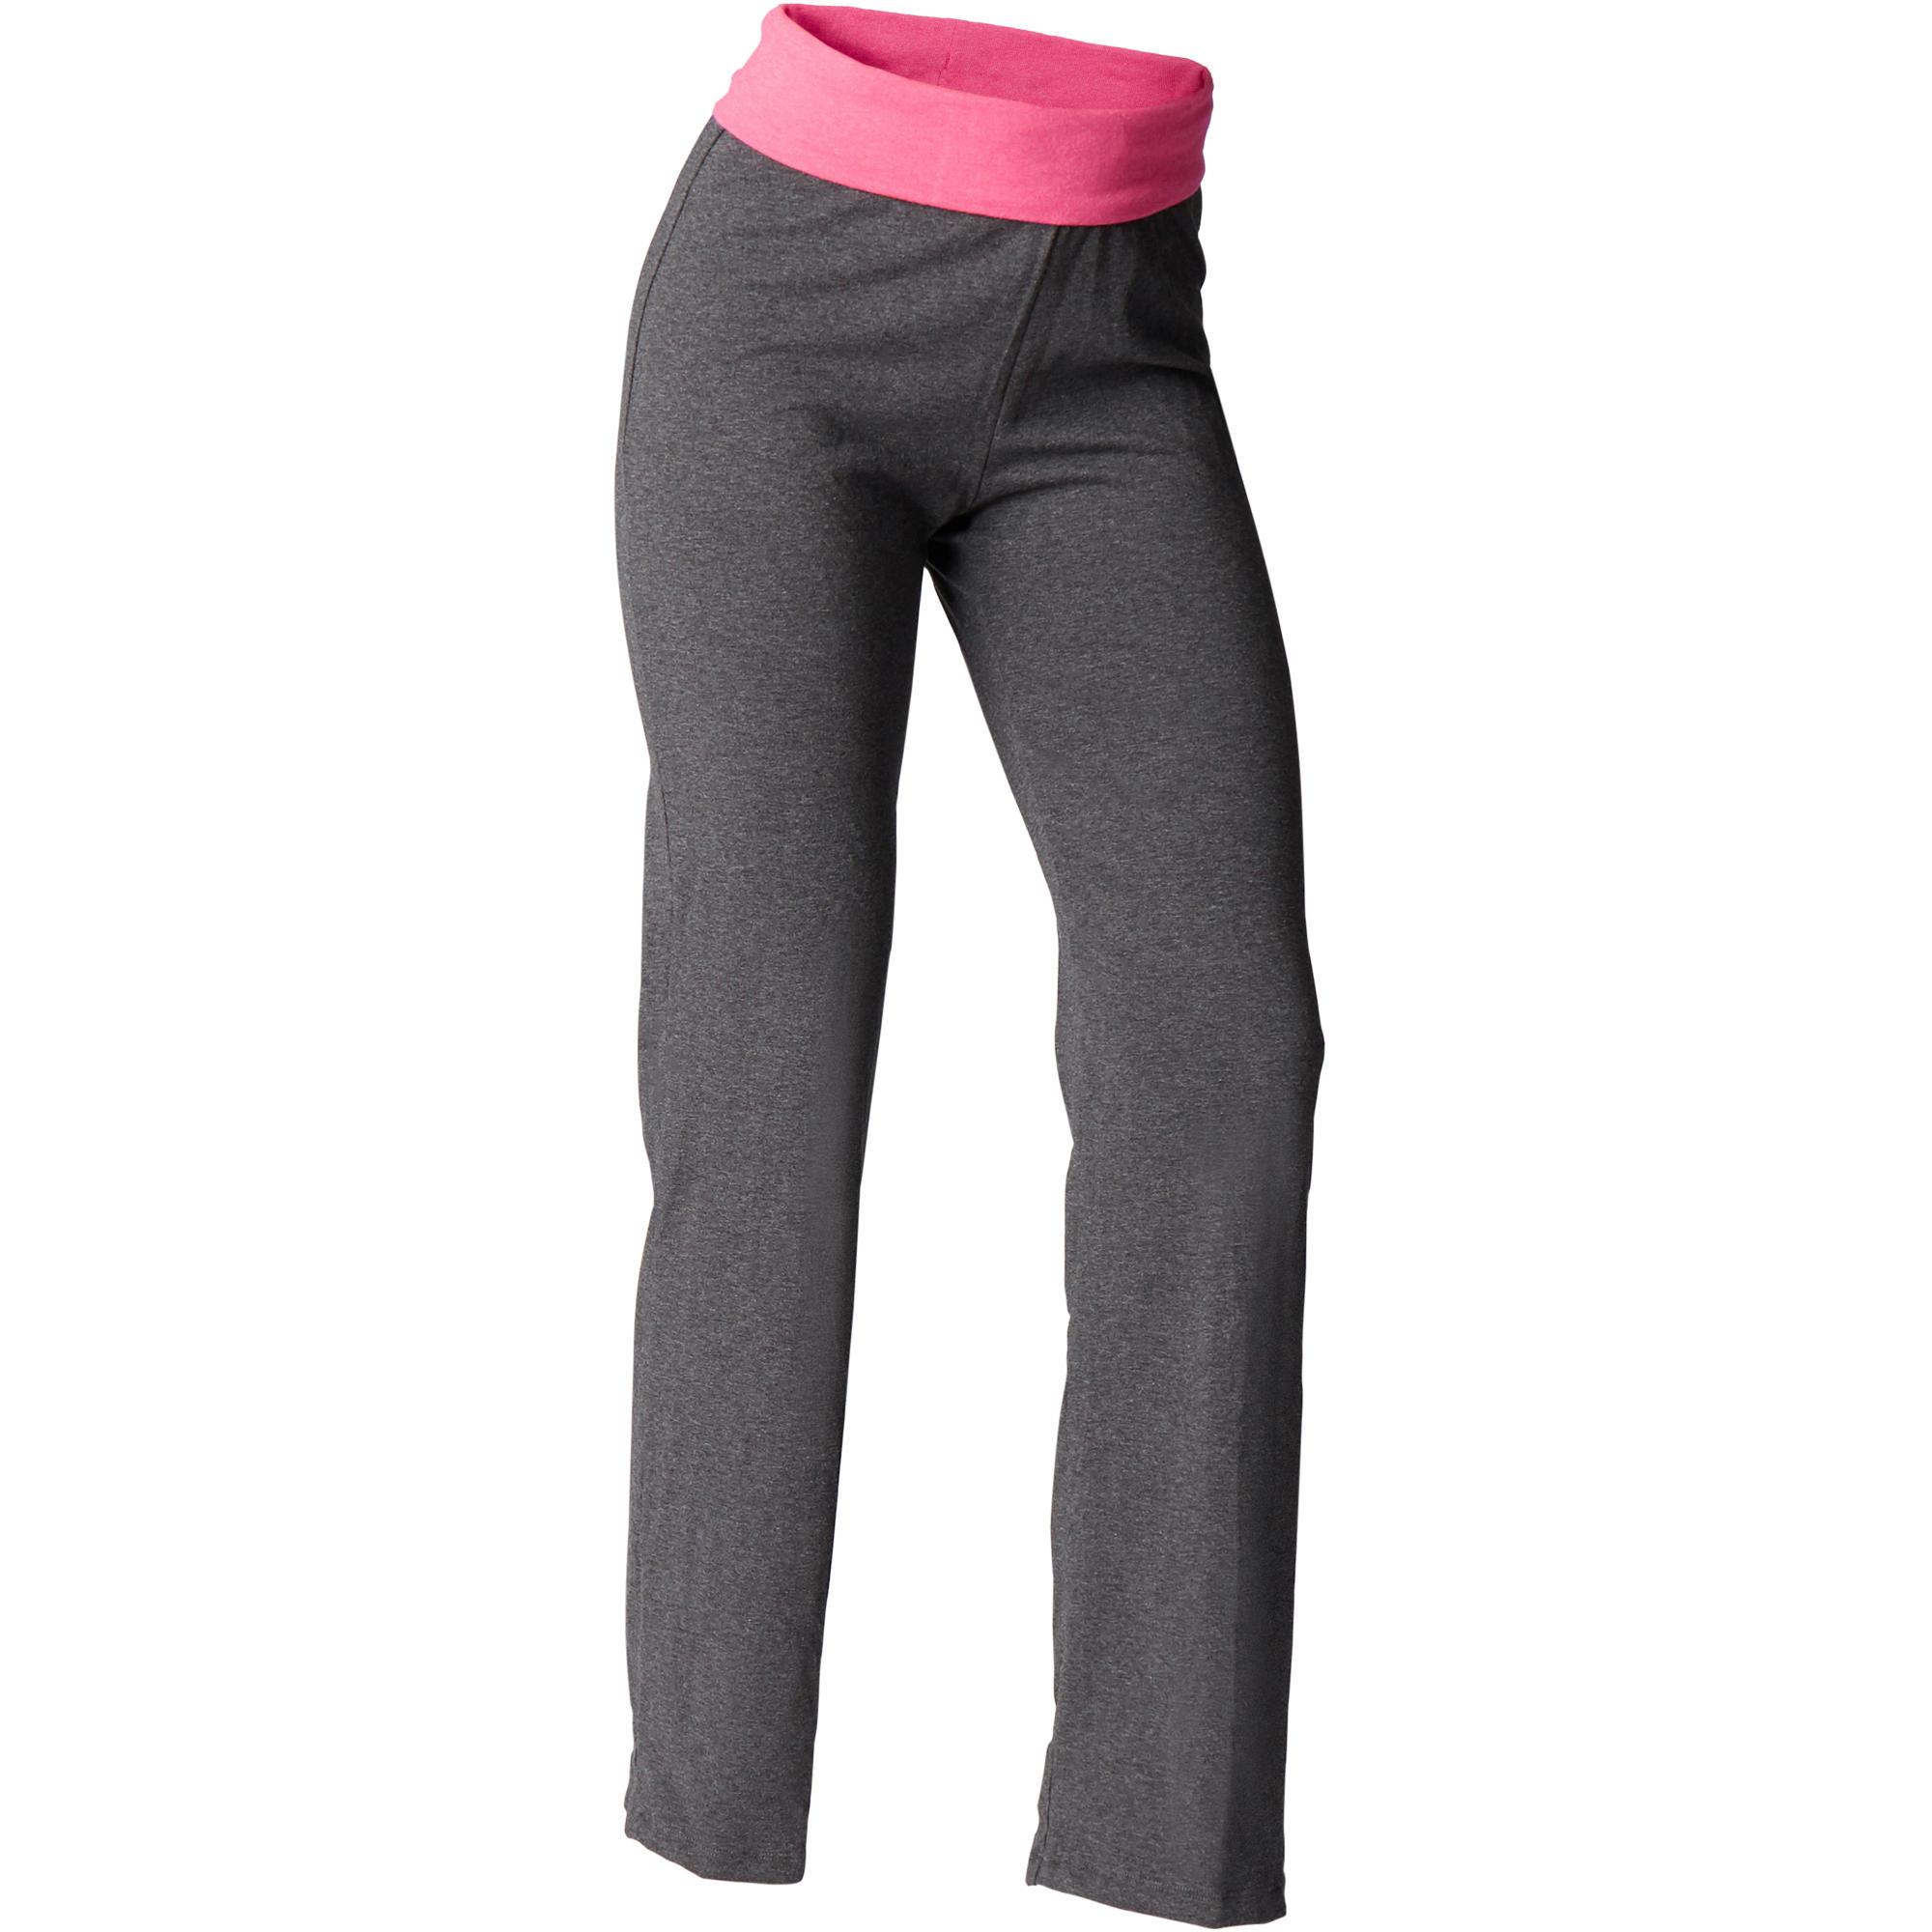 Women's Yoga Pants: Buy organic yoga bottoms for women